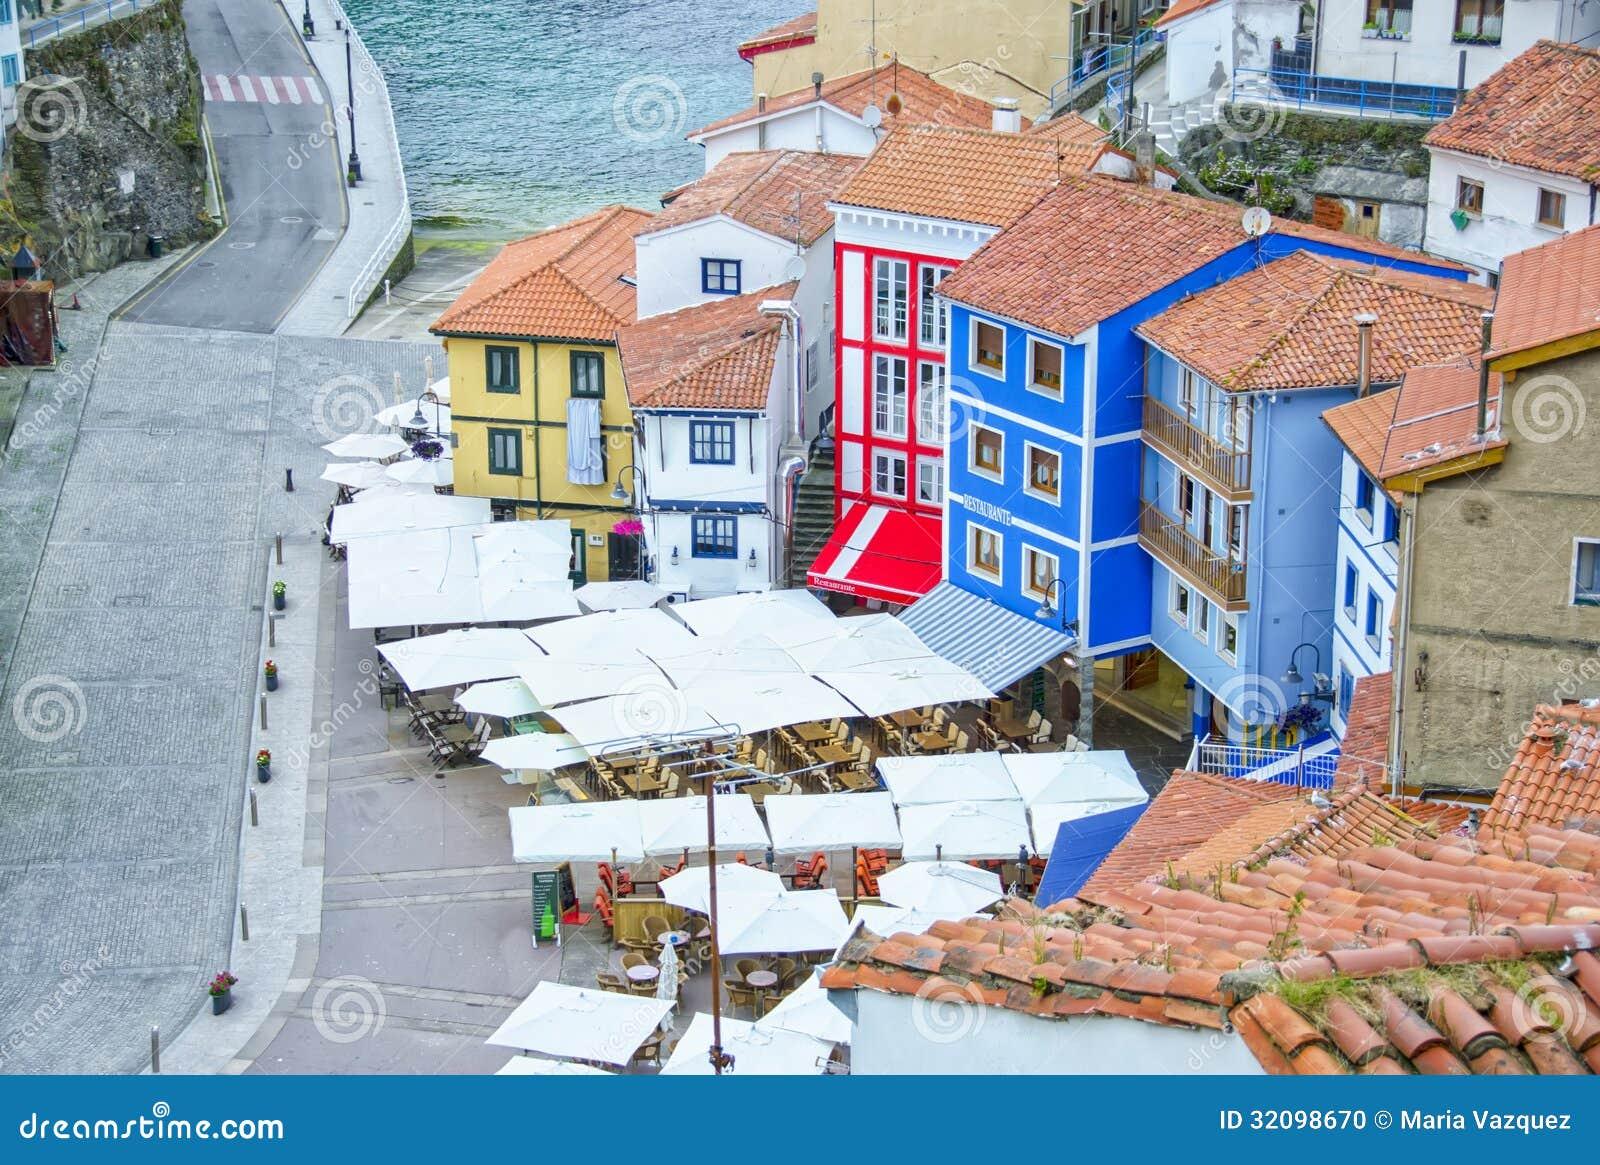 Cudillero Spain  city images : Cudillero, Spain Stock Photo Image: 32098670